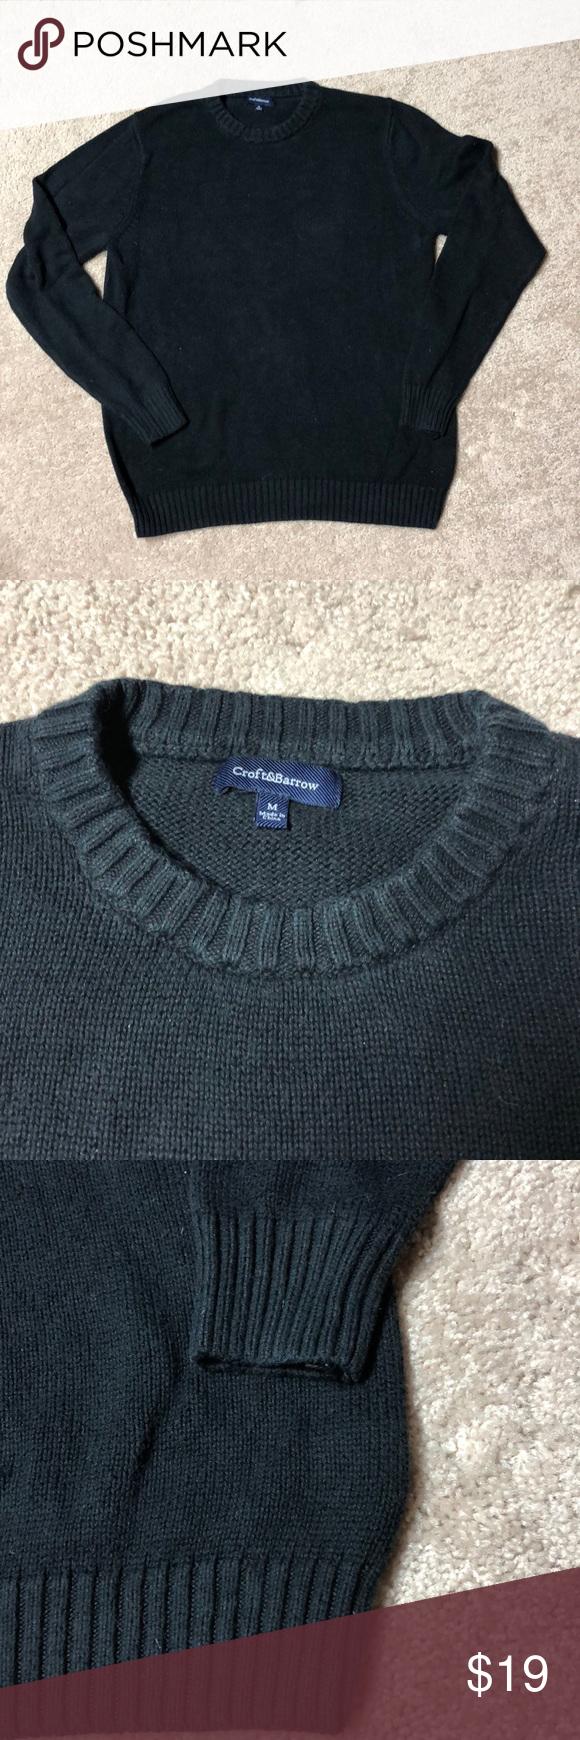 Men S Croft Barrow Crewneck Sweater Men S Thick Black Crewneck Sweater Gently Used Men S Size Medium Croft Sweaters Crew Neck Sweater Clothes Design [ 1740 x 580 Pixel ]